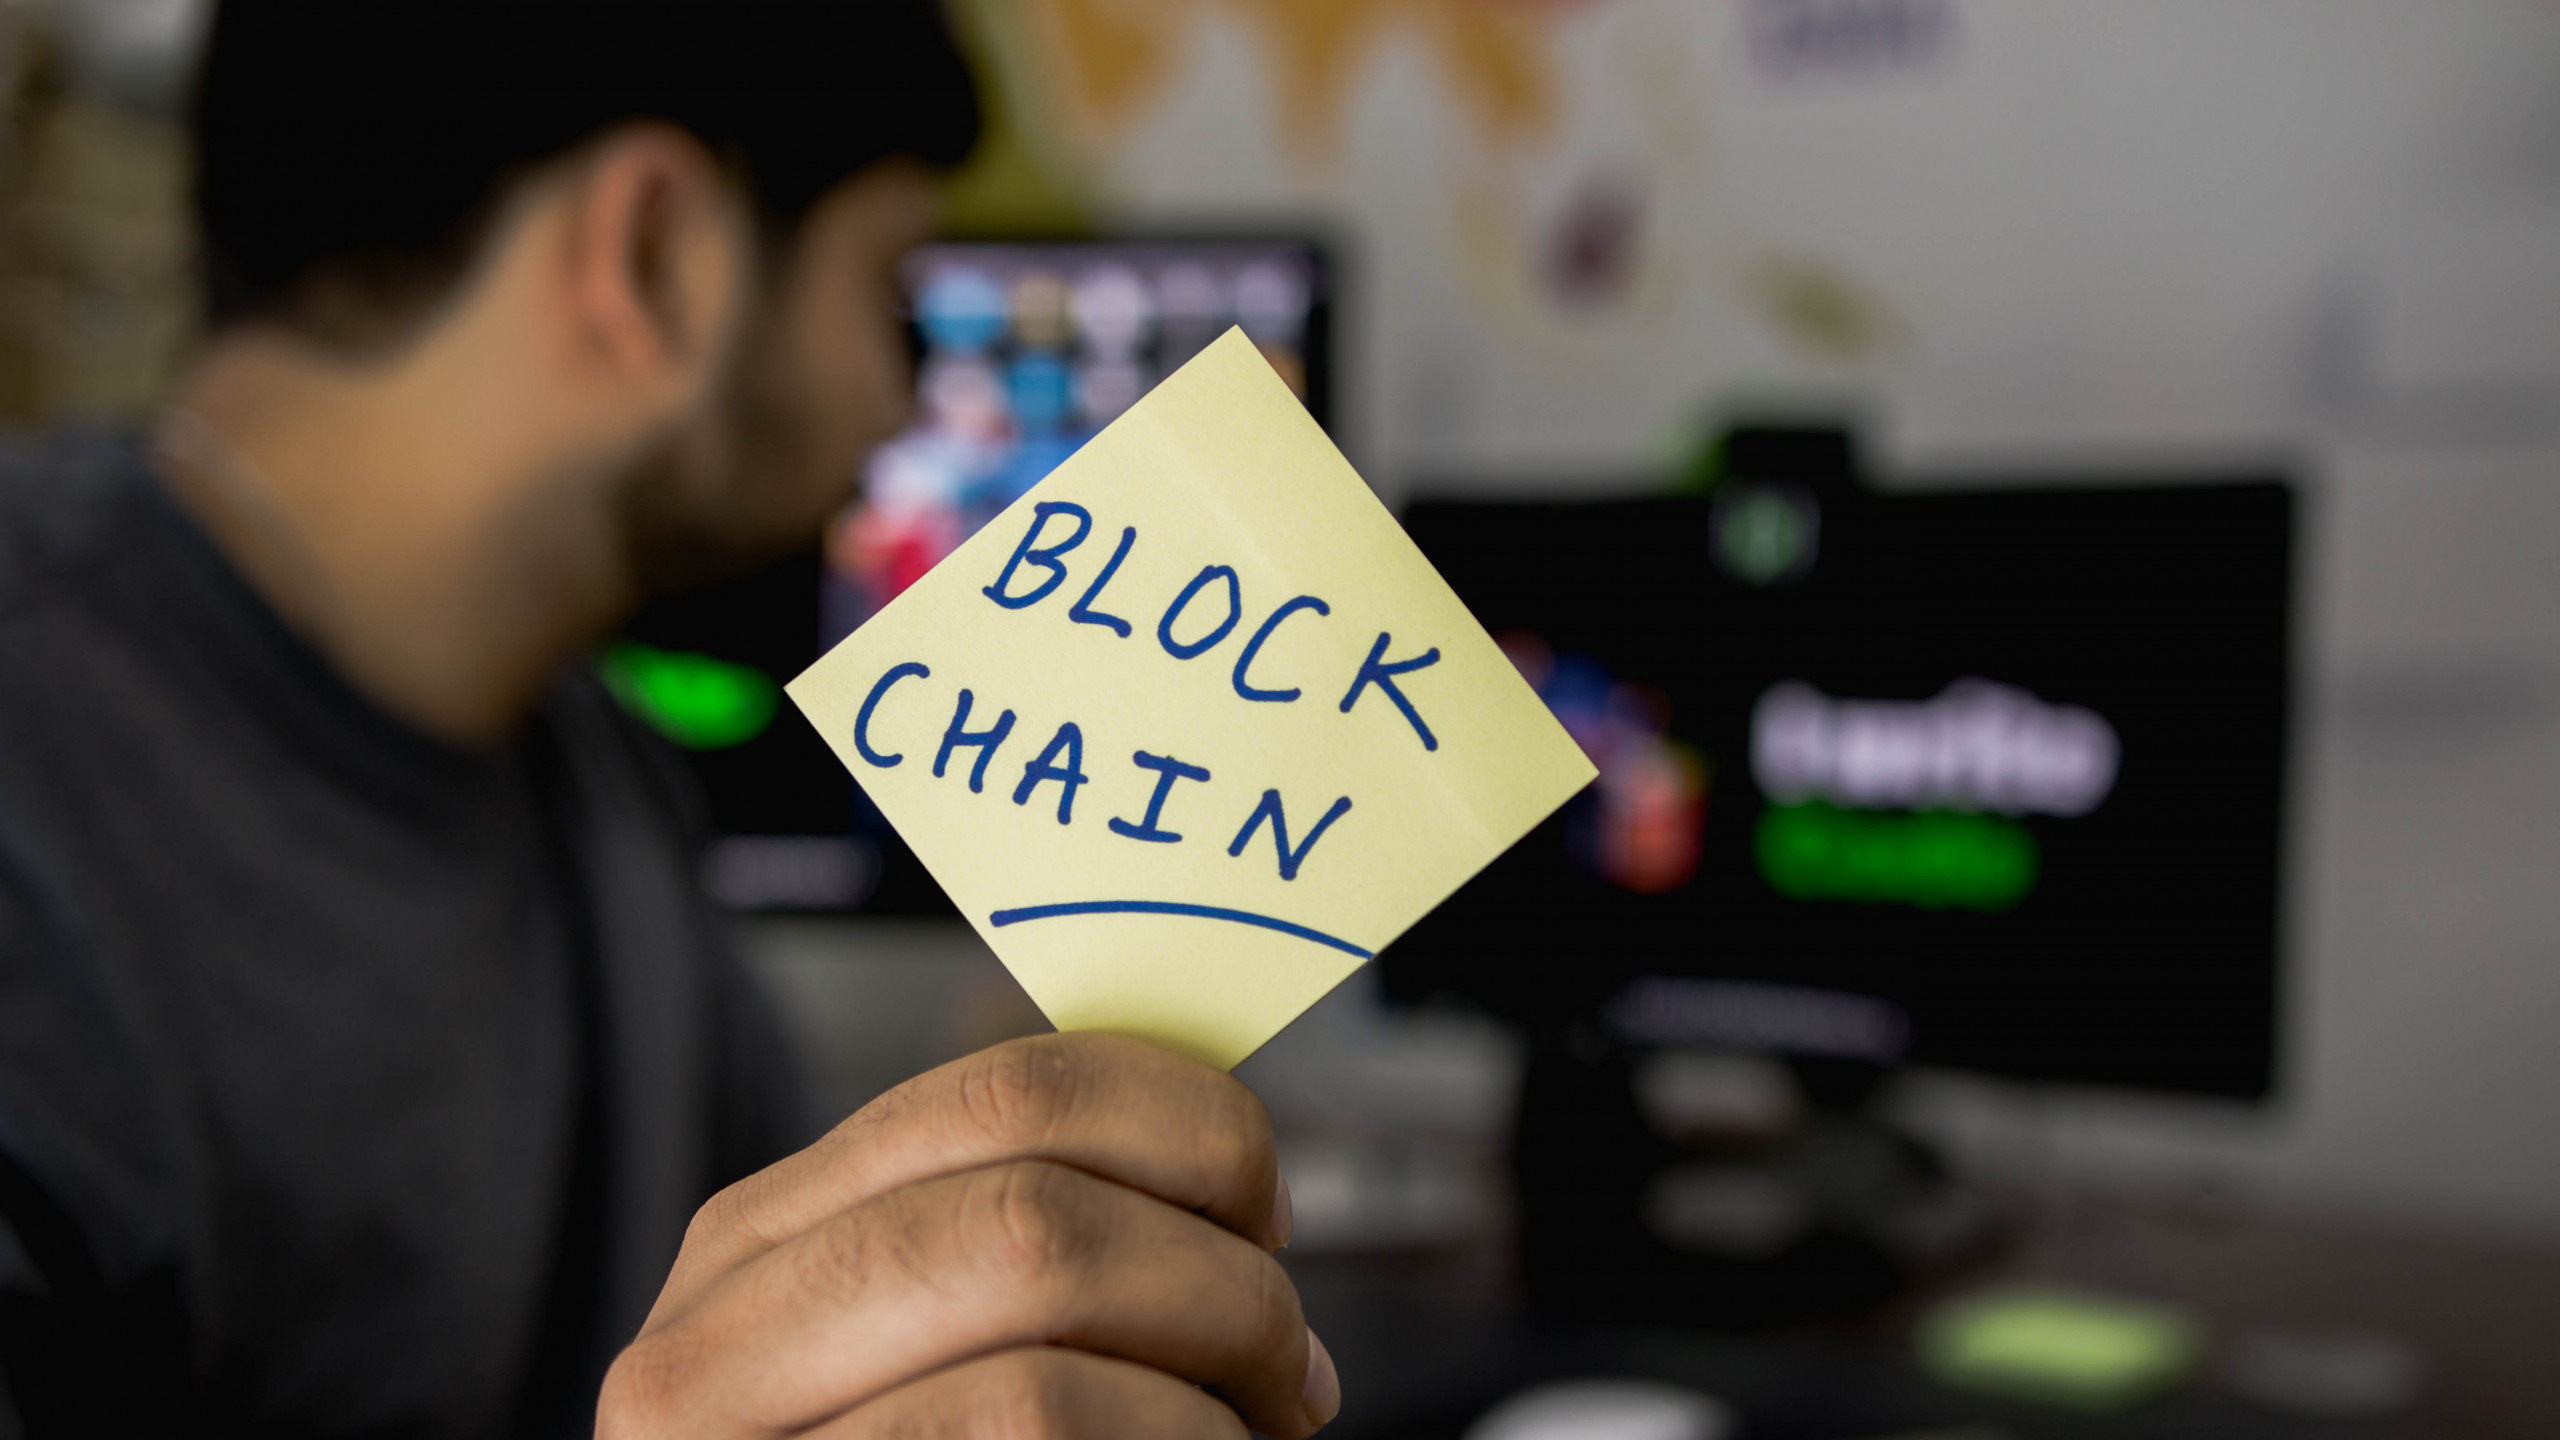 Blockchain technology applications in the modern world